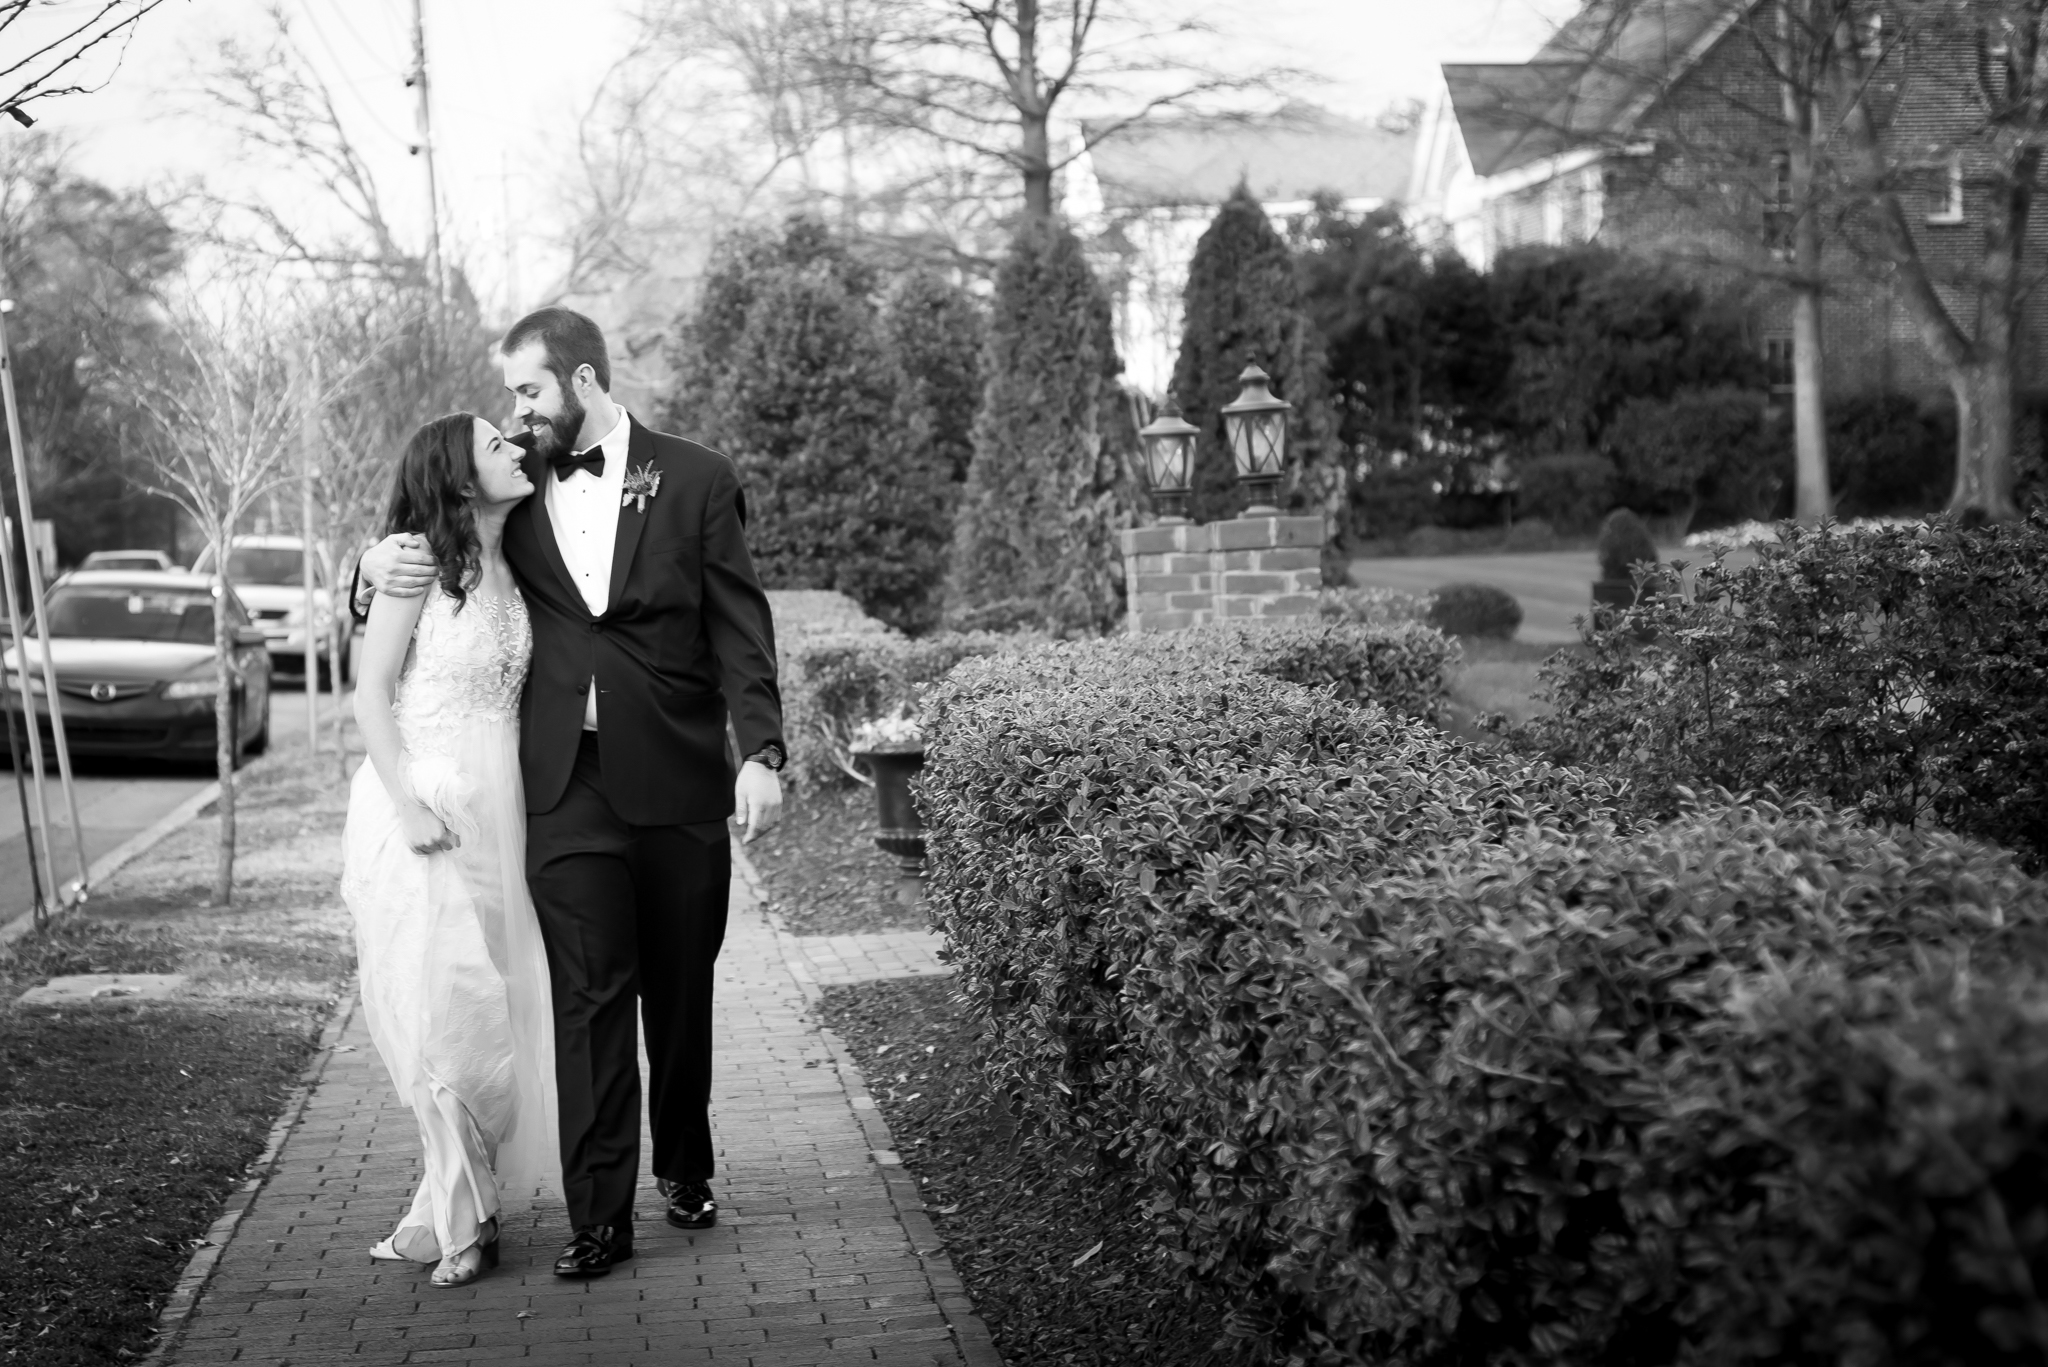 merrimon-wynne-wedding-photography-024.jpg